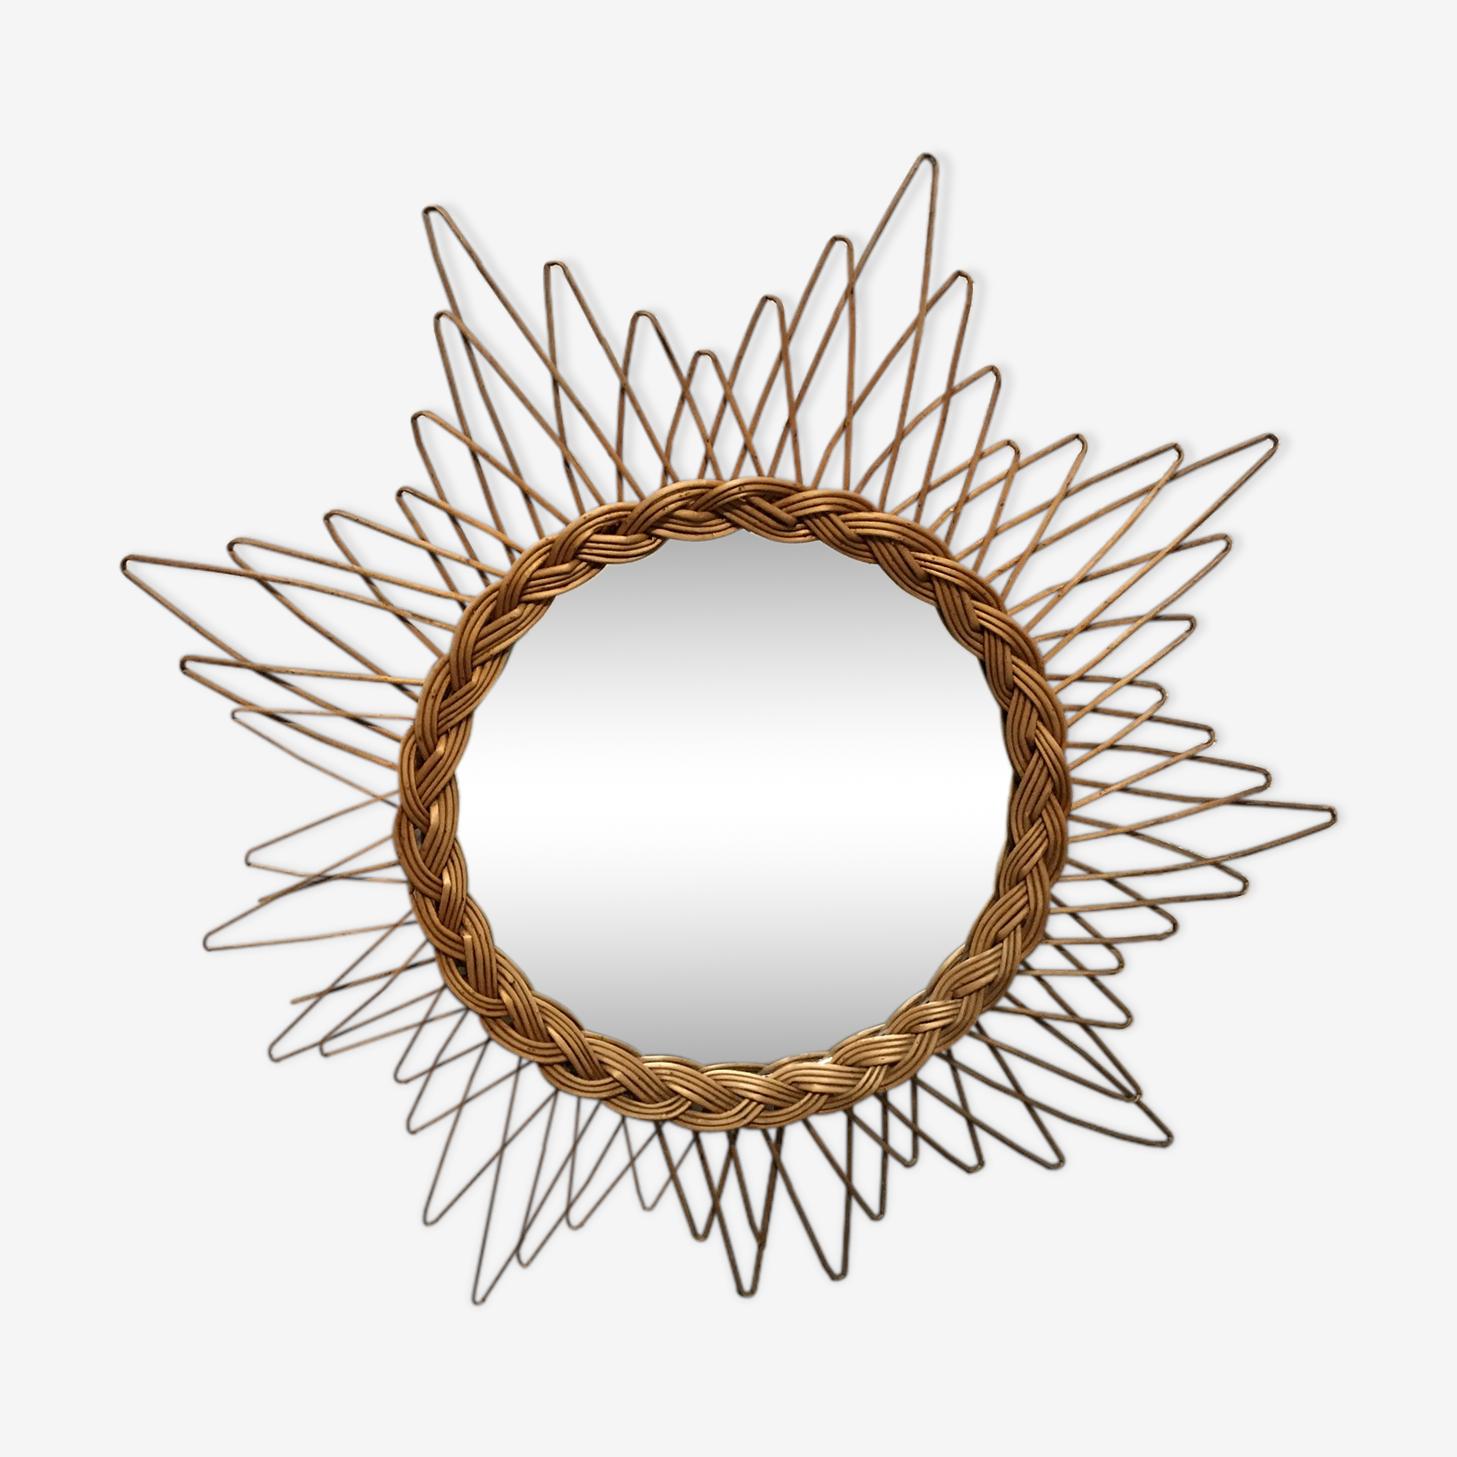 Sun braided - 64 cm - 50s vintage rattan mirror